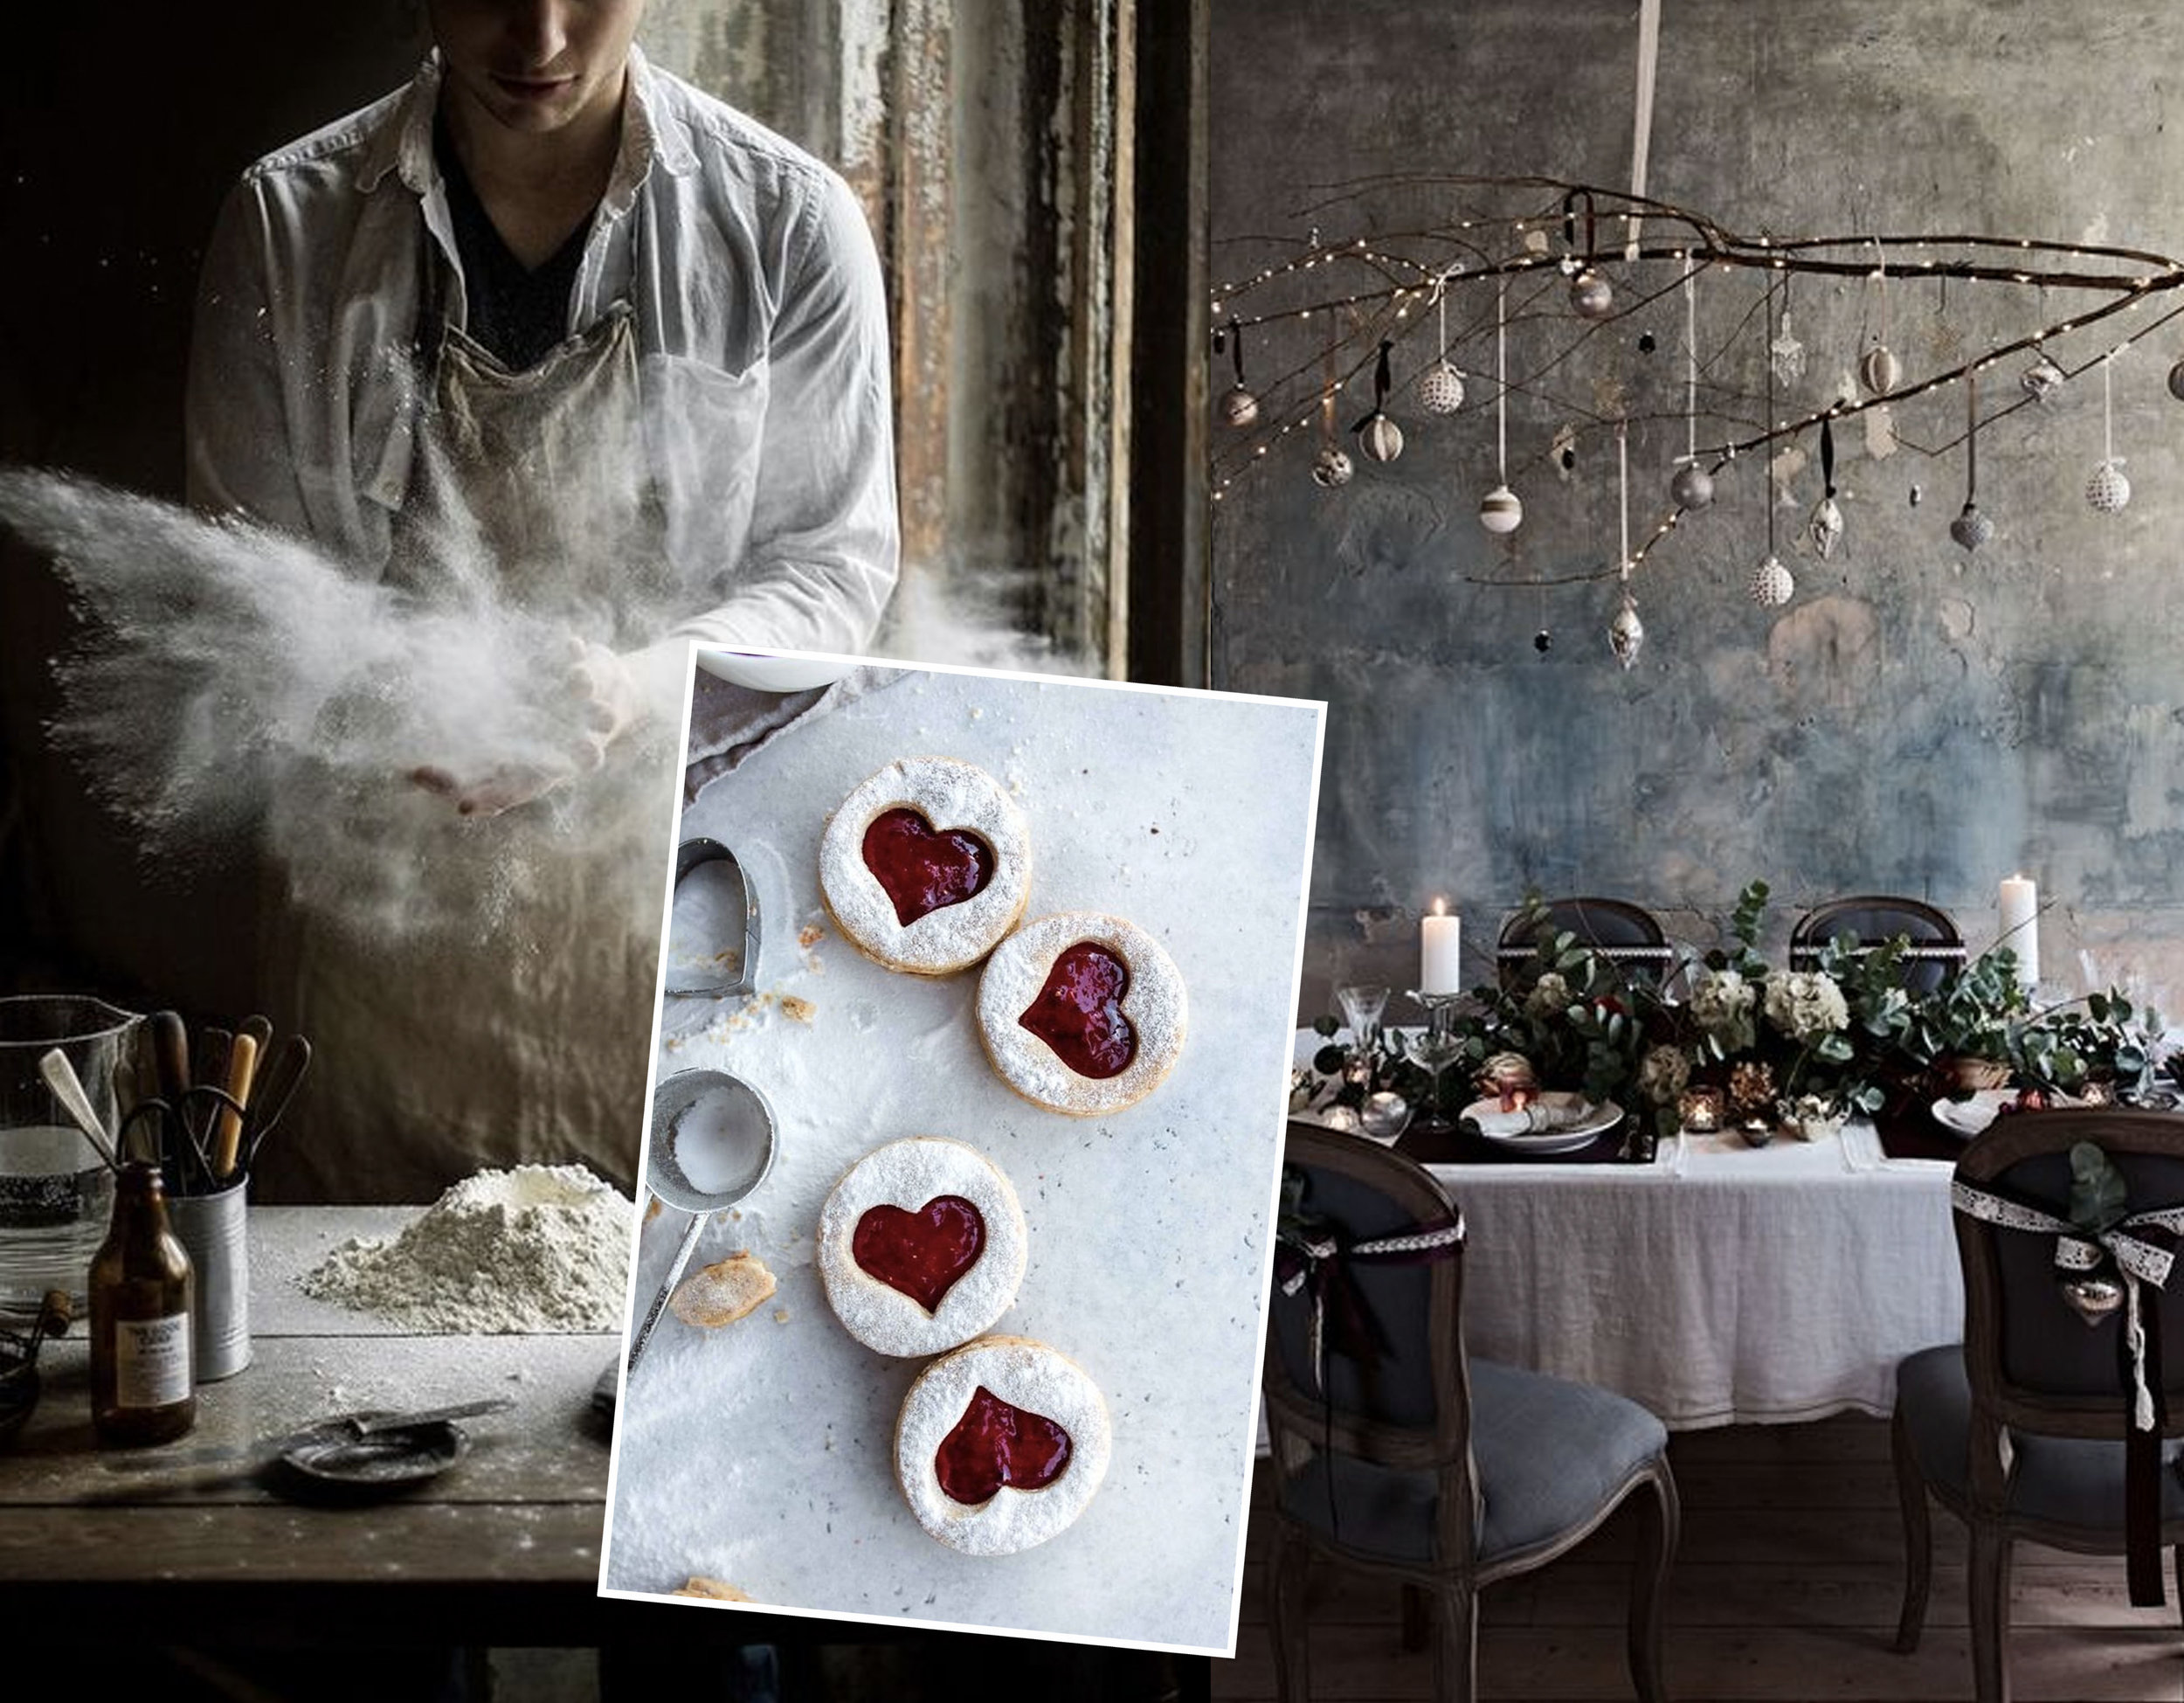 preparing the dinner via  Instagram  - cookiies  Vanilla Crunnch  - dining room via  House Beautiful